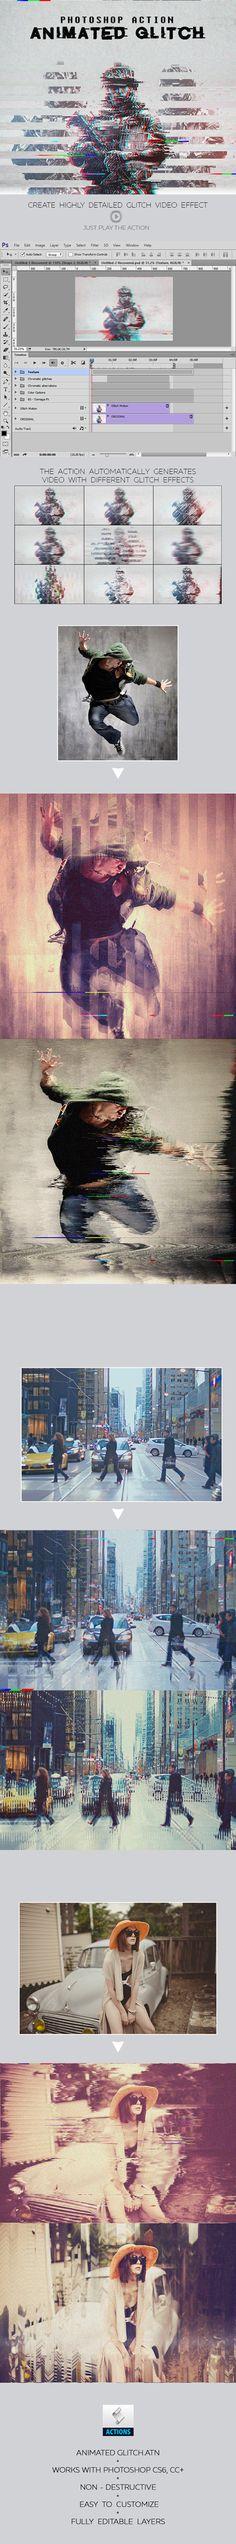 Animated Glitch Photoshop Action